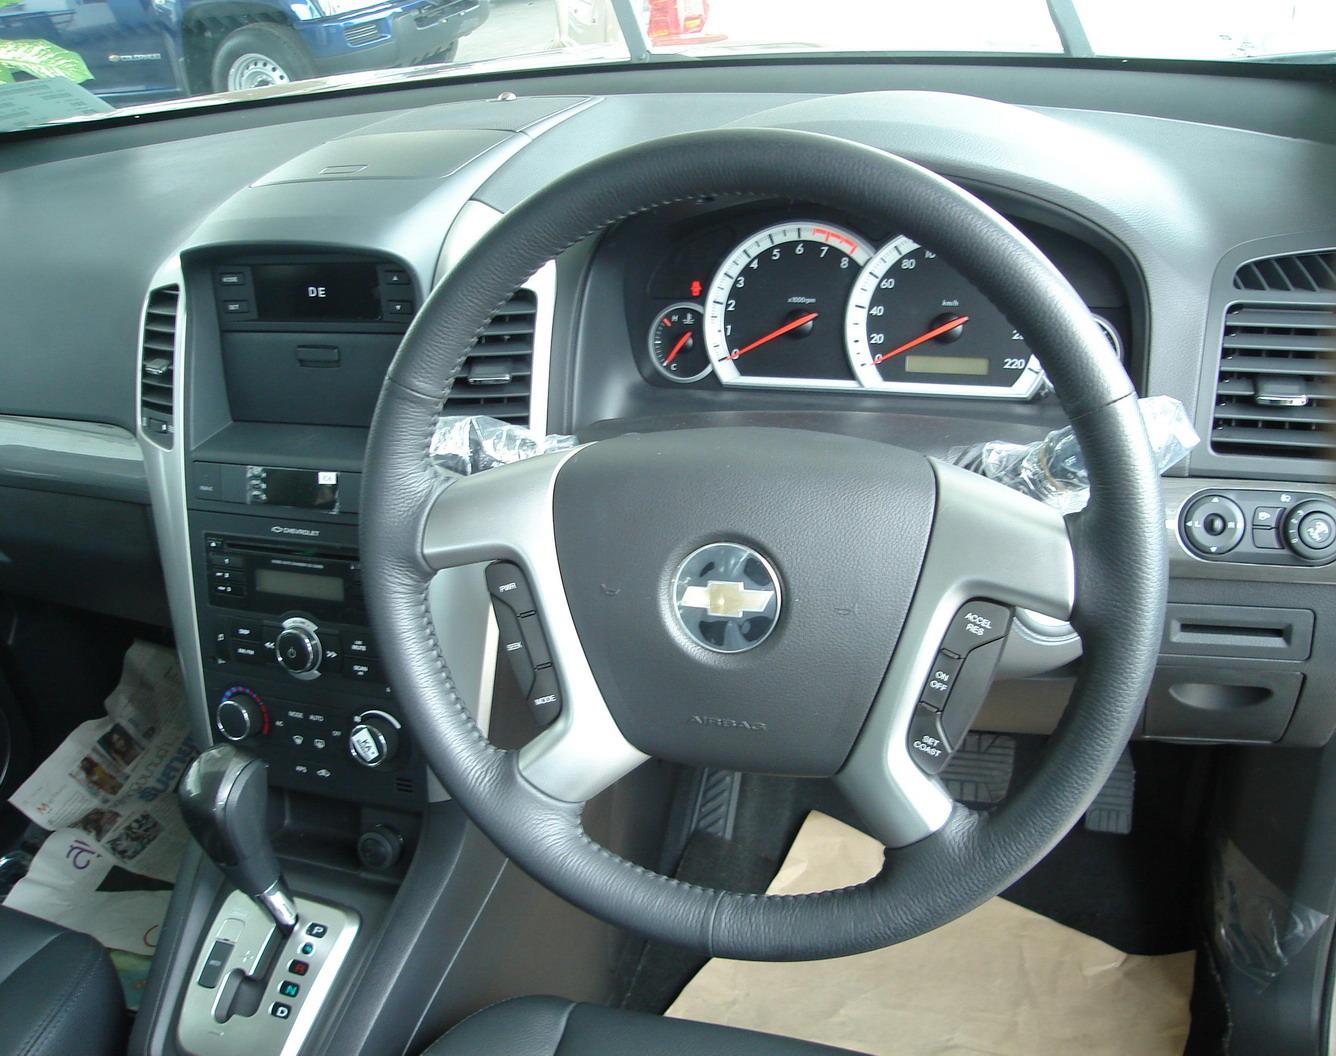 Image - Chevrolet Captiva interior 3.jpg | Tractor & Construction ...